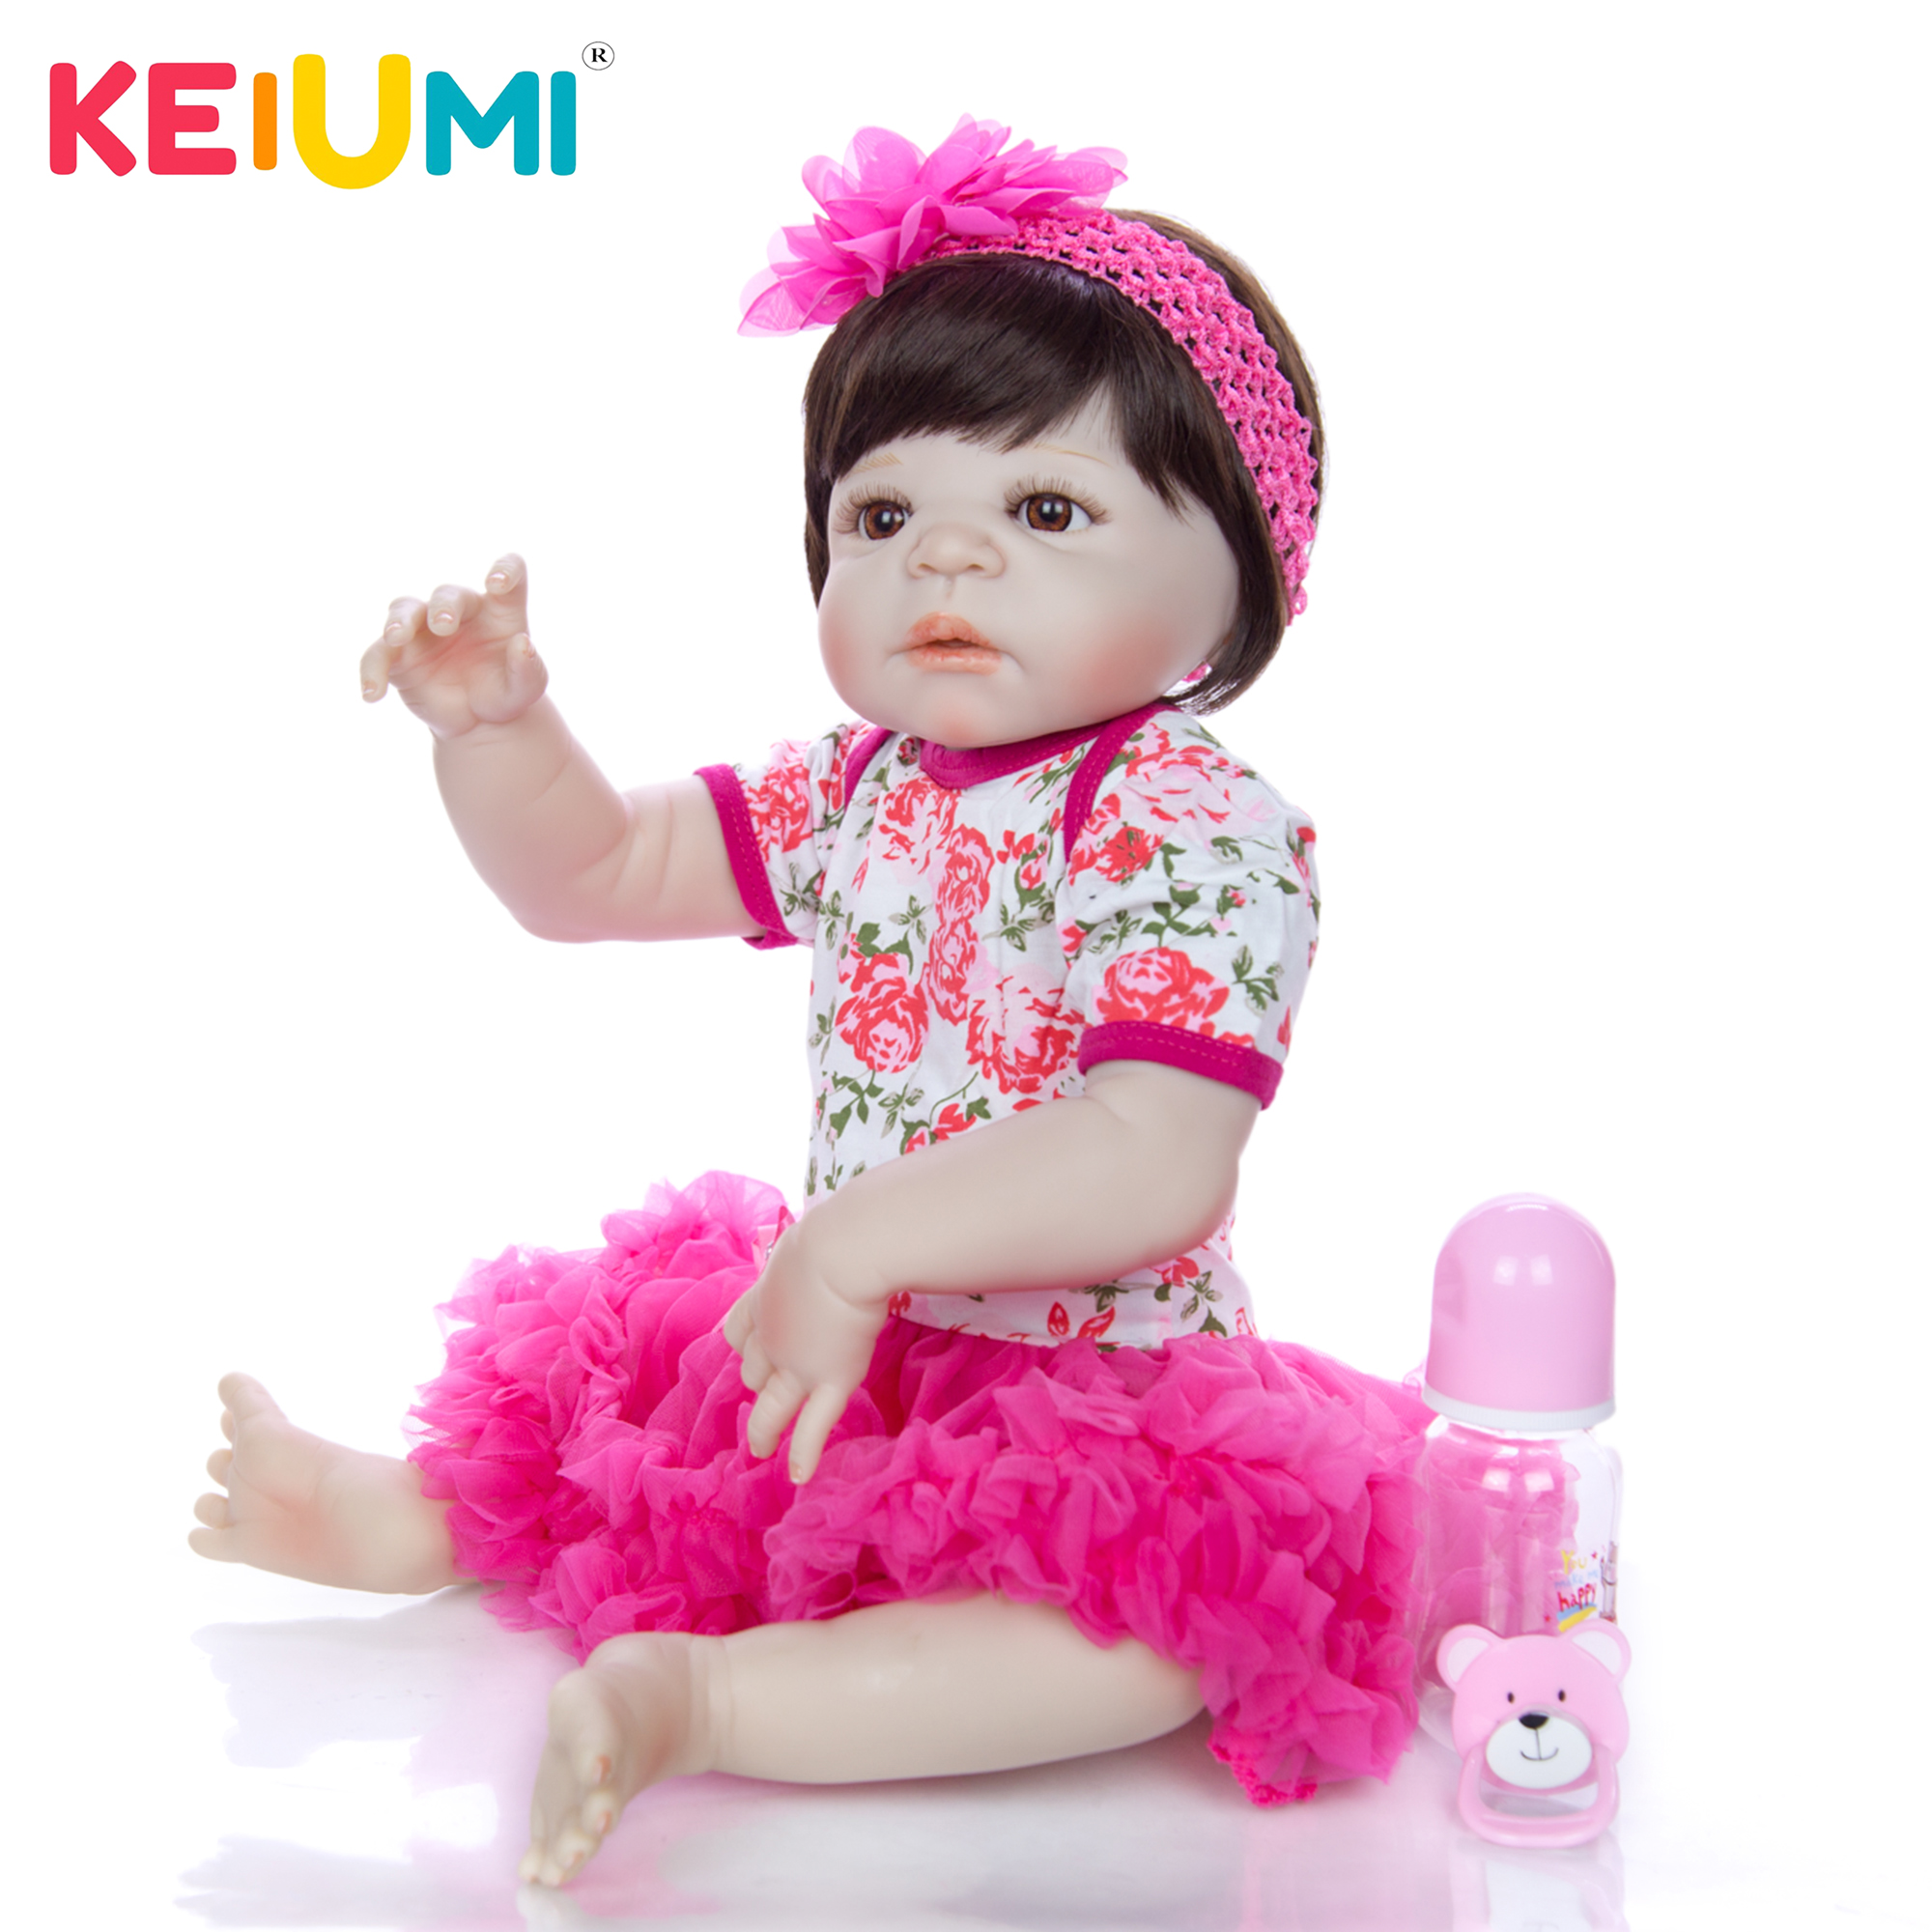 KEIUMI Fashion Reborn Girl Dolls 23 57 cm Lifelike Newborn Princess Baby Dolls For Sale Kids